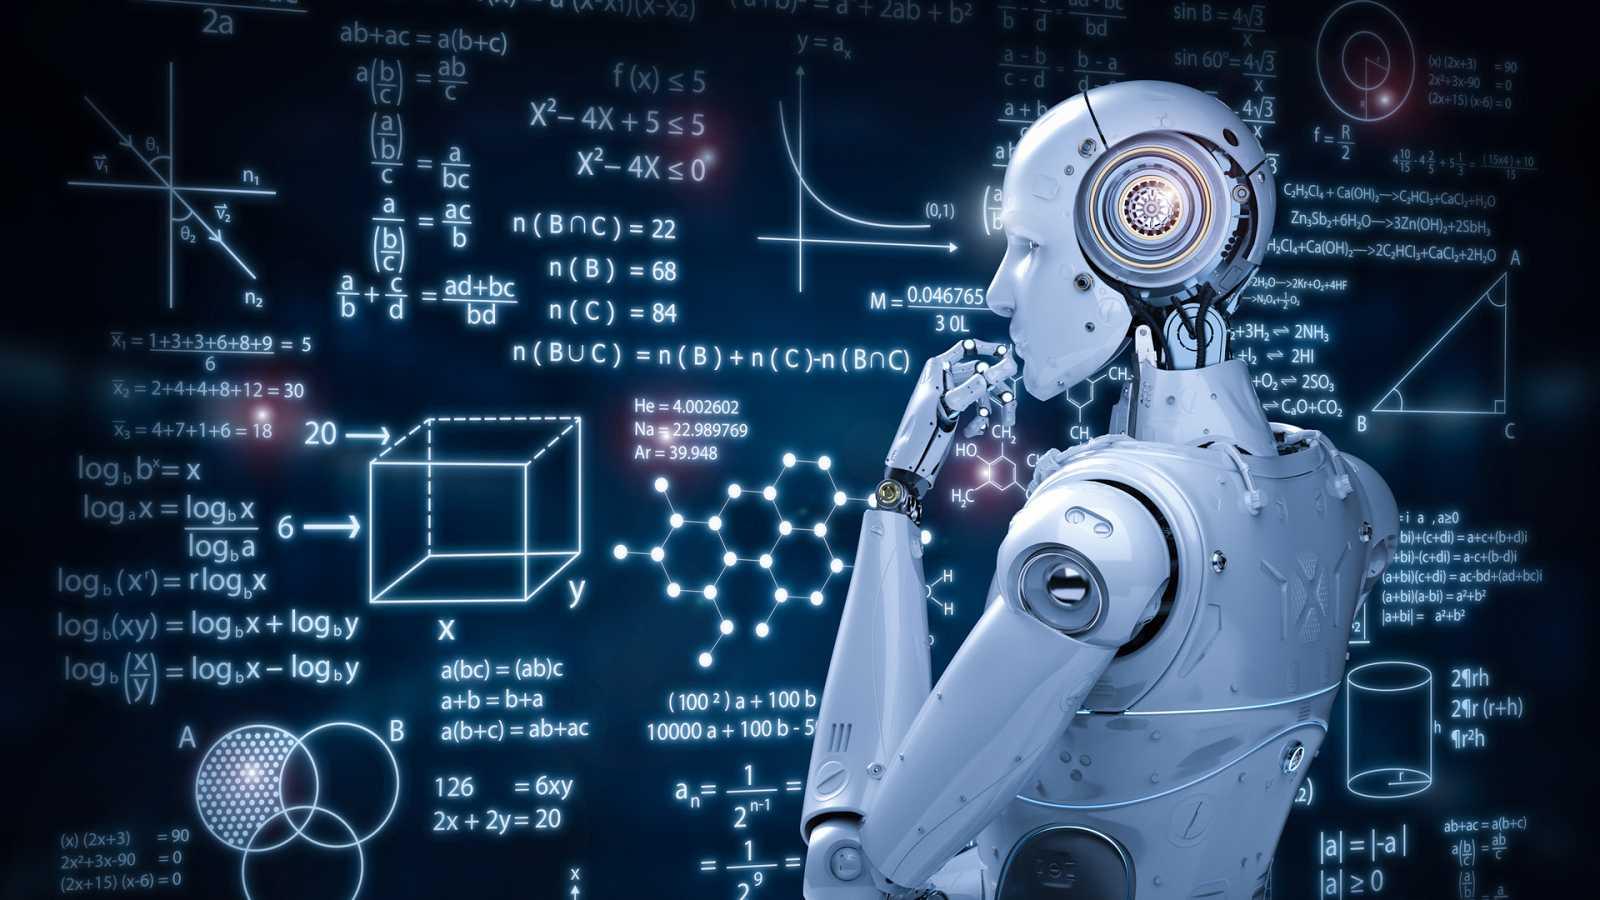 A golpe de bit - Tocando el 'machine learning' - 18/01/21 - escuchar ahora